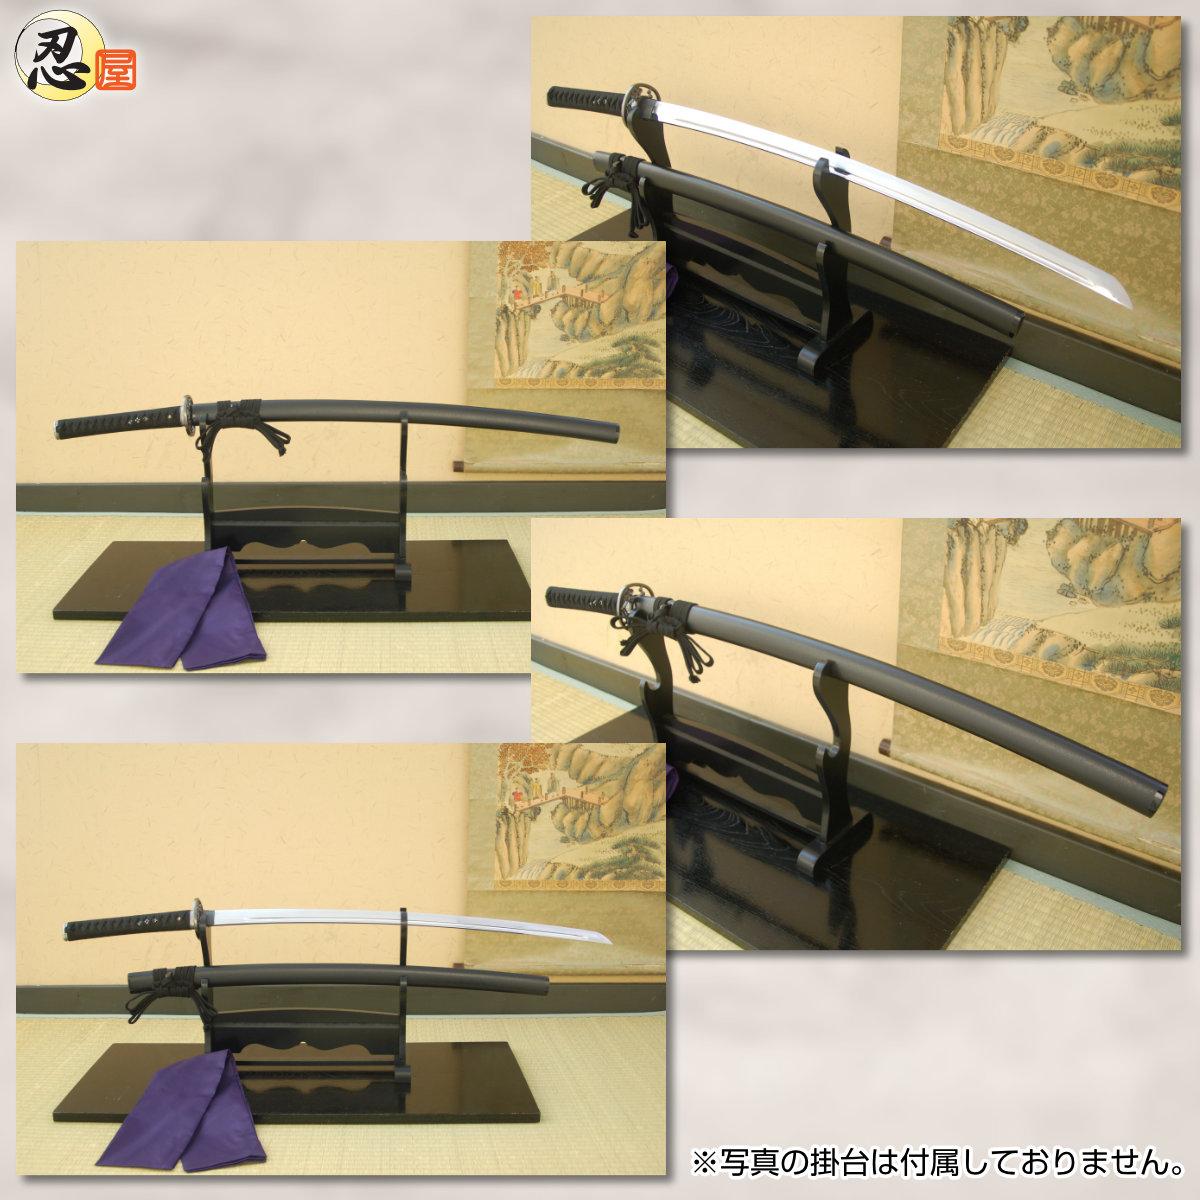 居合刀-居合練習刀DX 『素振り刀 梅透かし鍔』-砂型合金-(刀袋付き)居合練習に最適